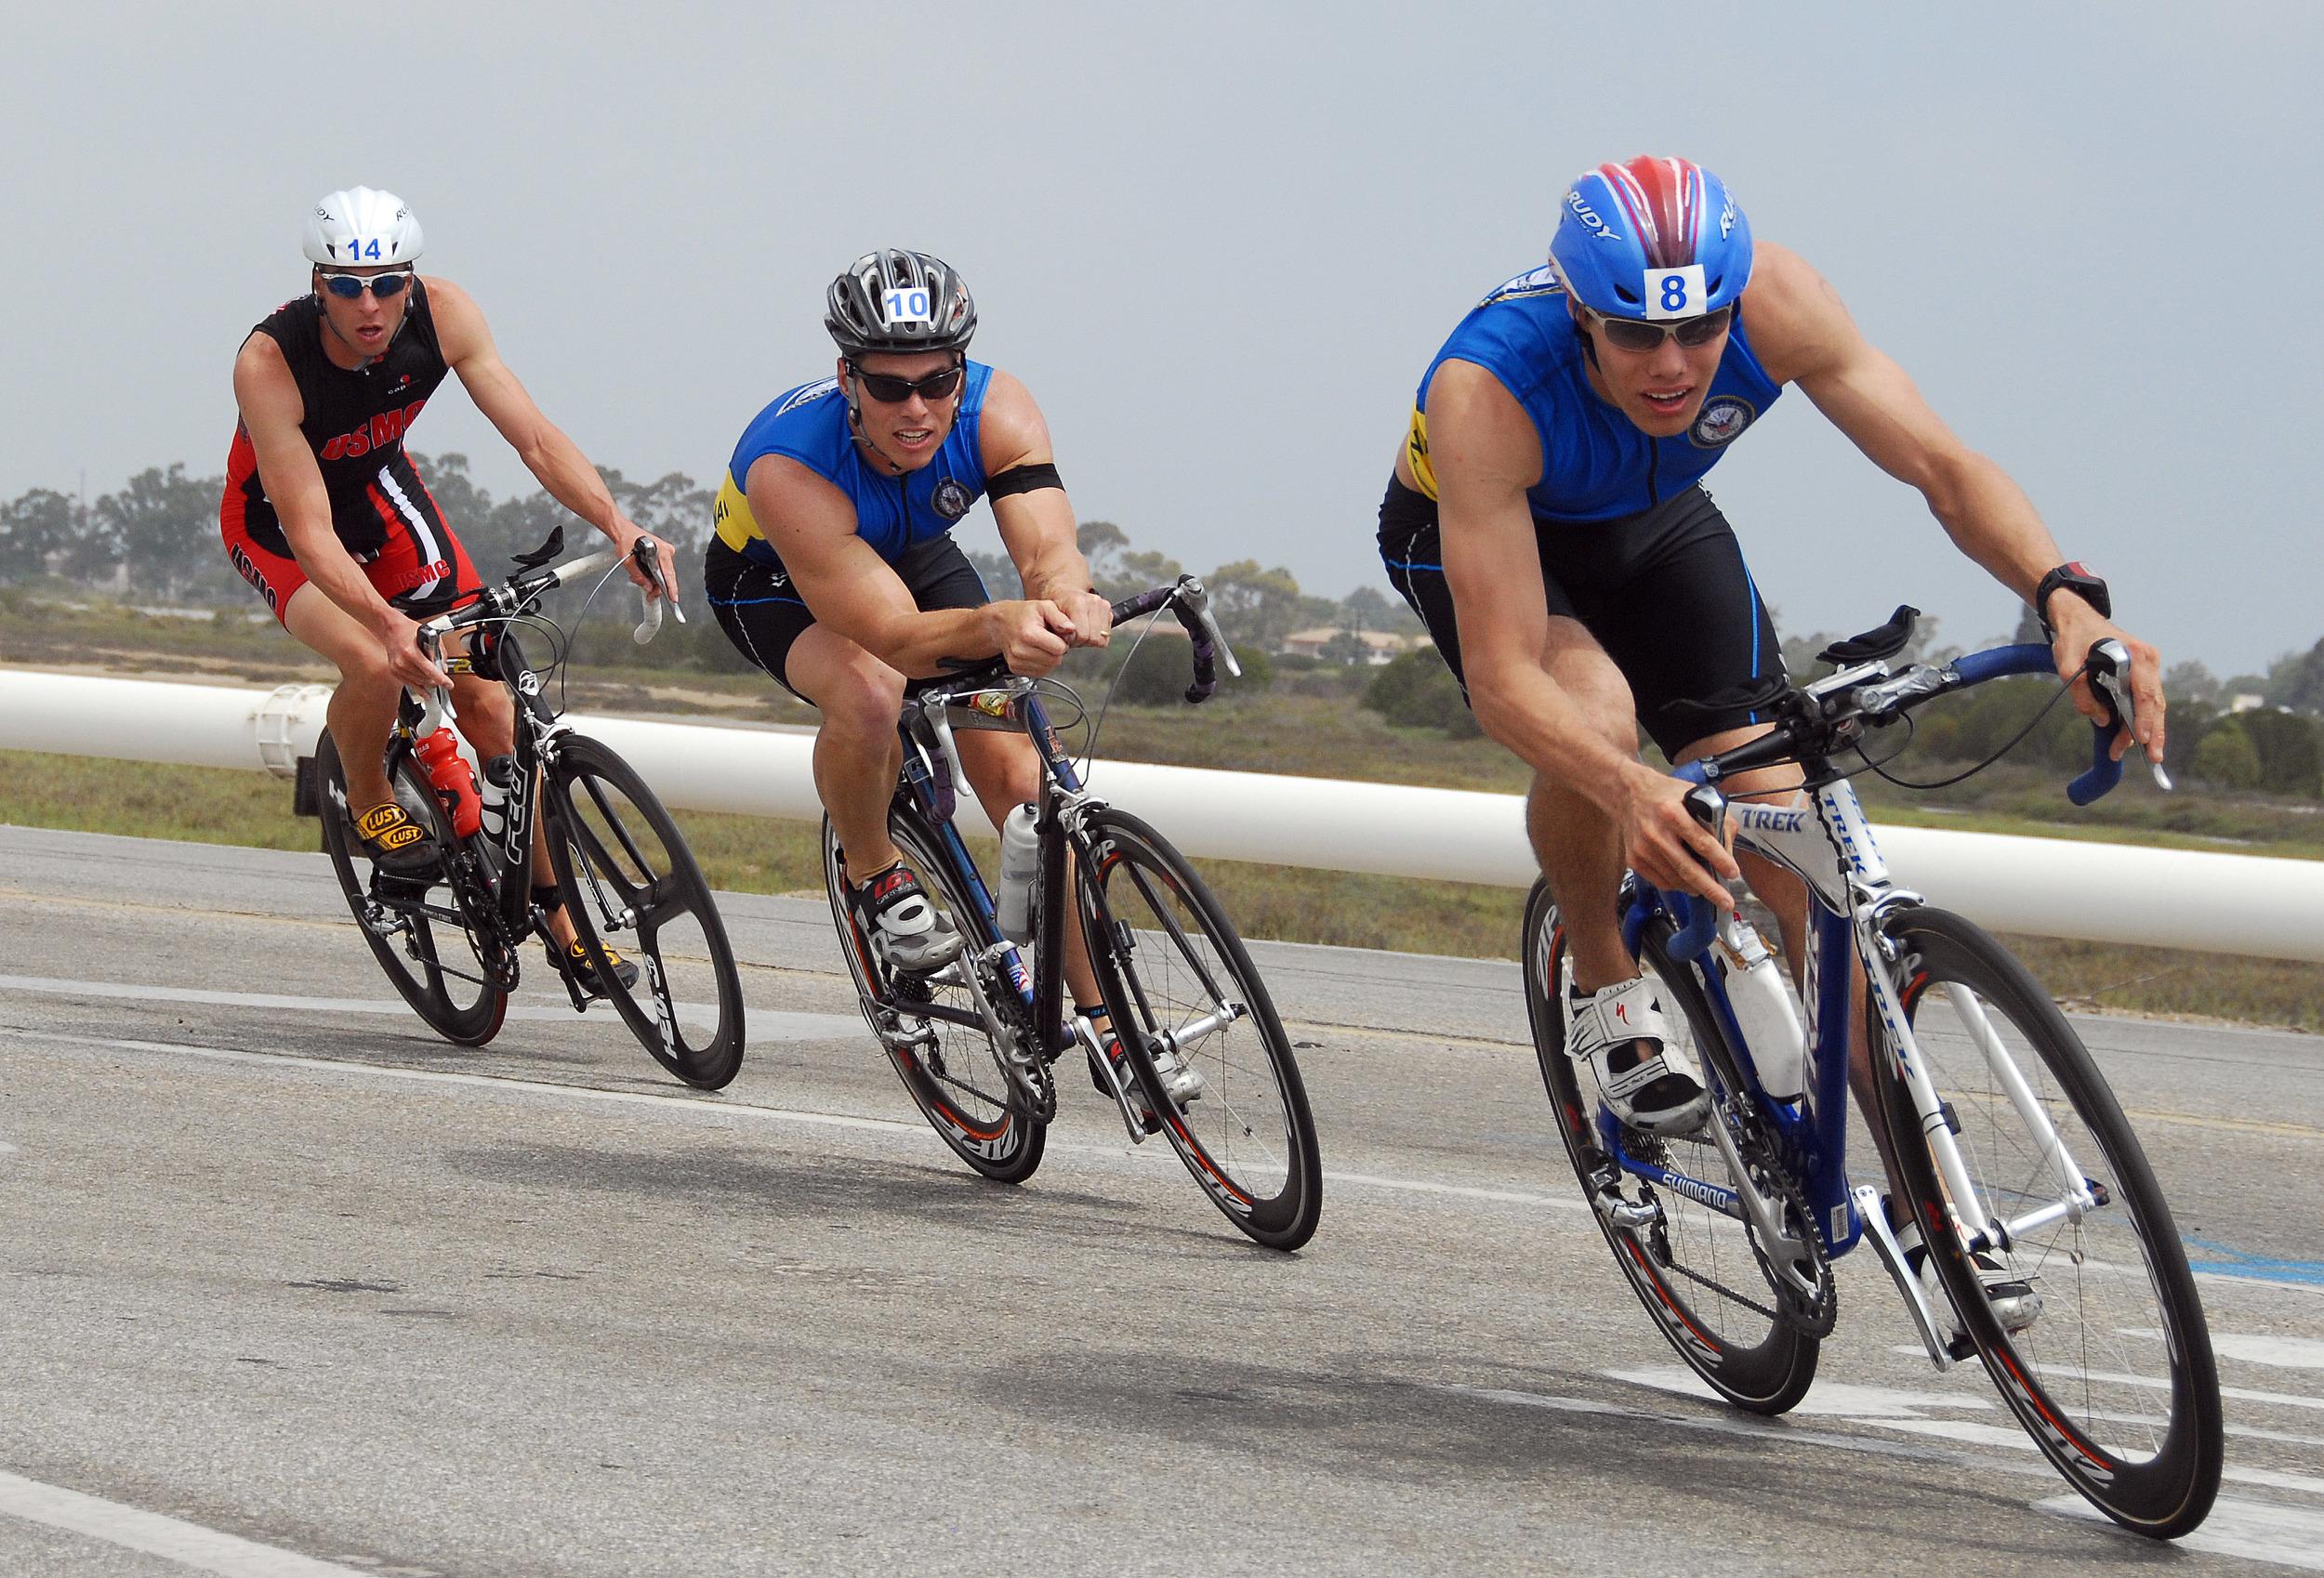 Two Navy Triathletes